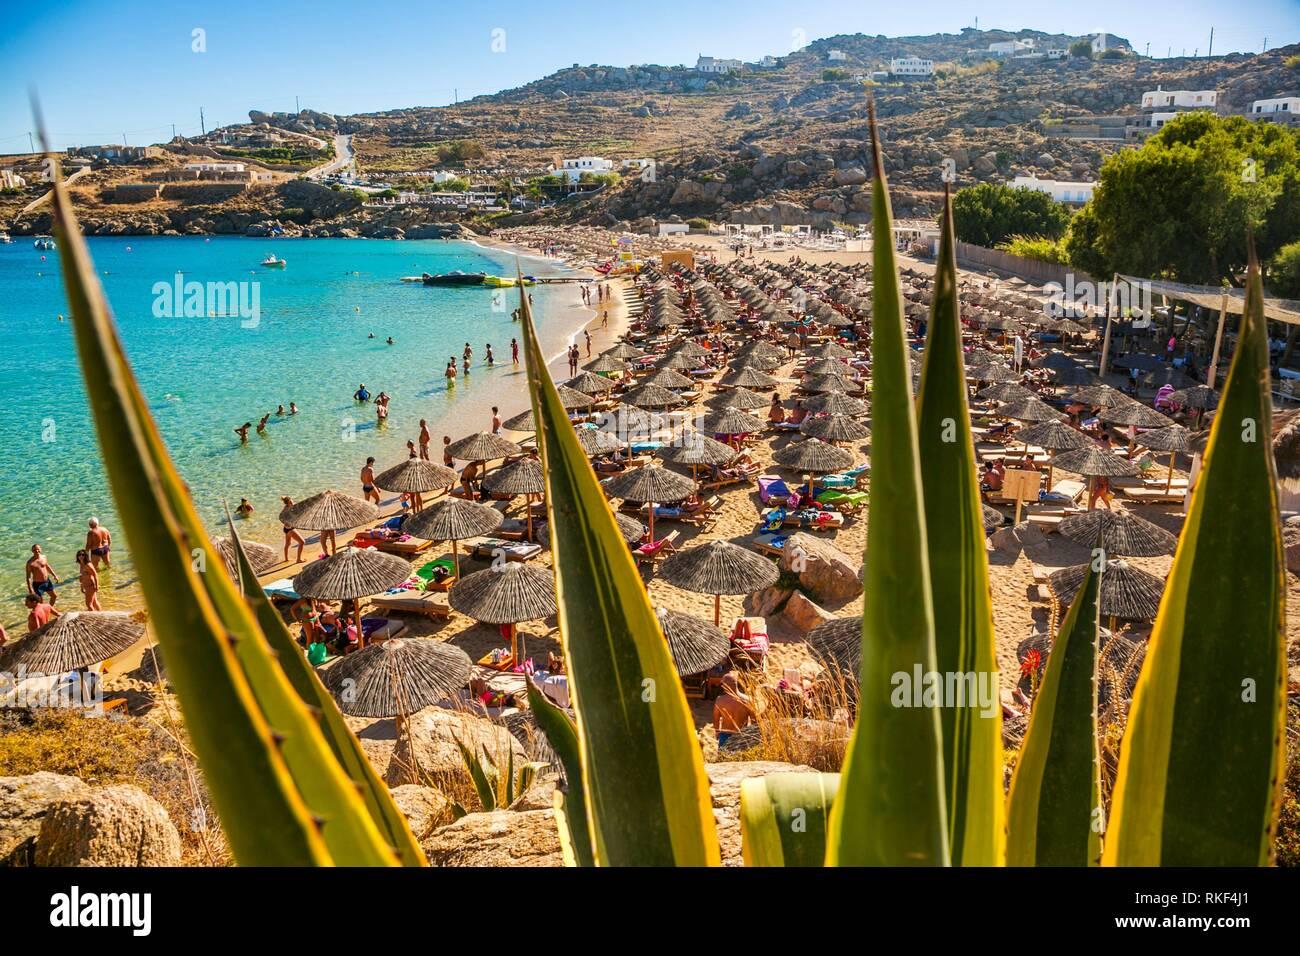 Super Paradise Beach. Mykonos Island. Ciclades Islands. Greece. - Stock Image